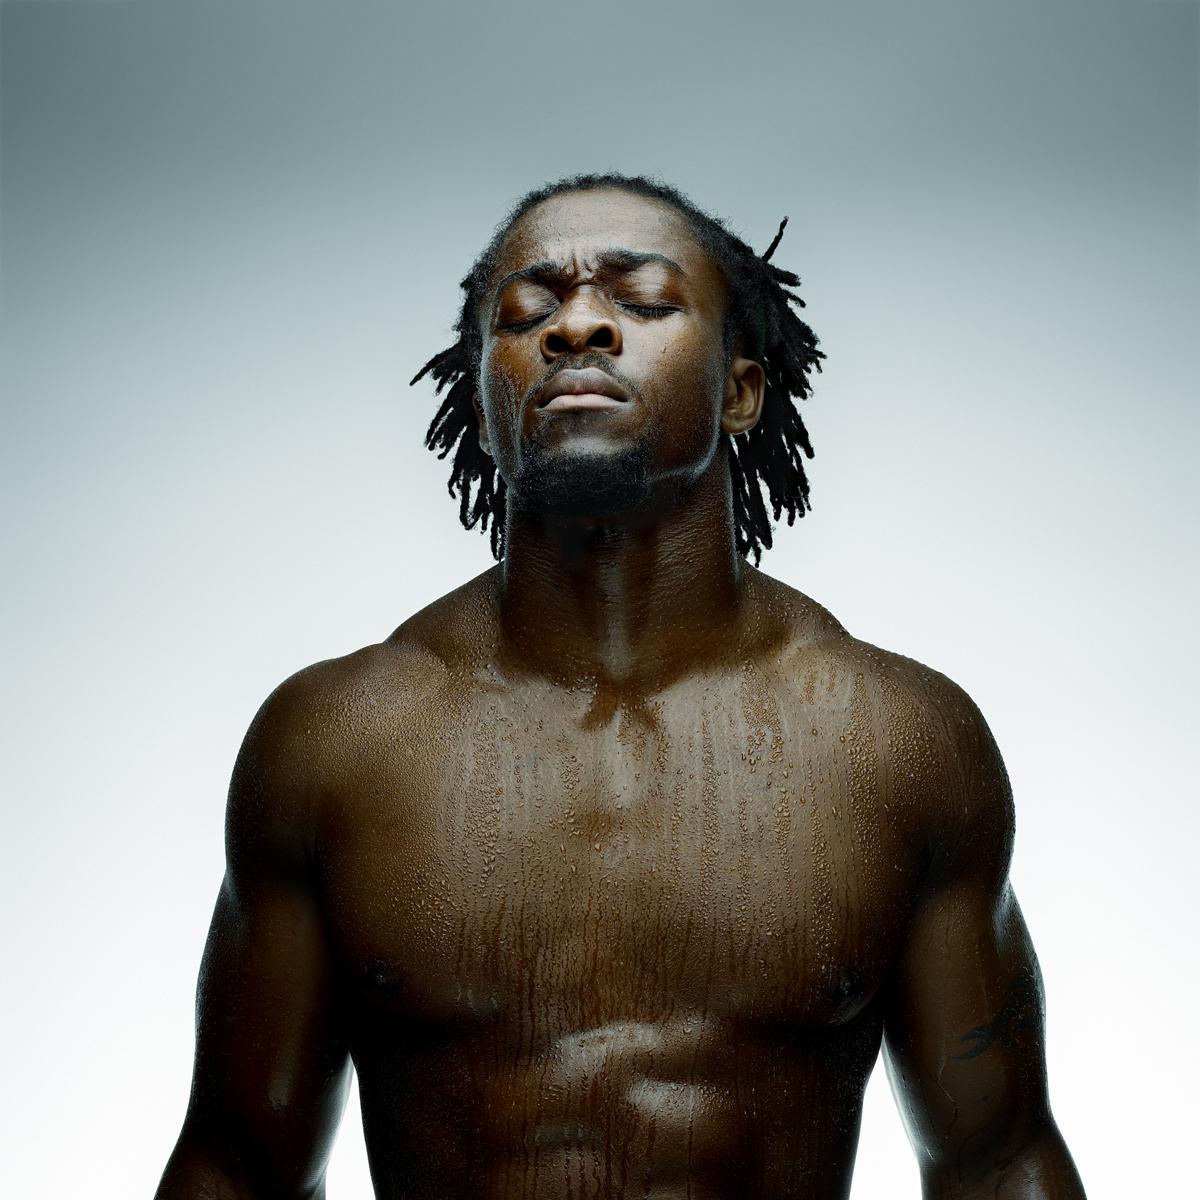 professional wrestler Kofi Kingston - age: 39